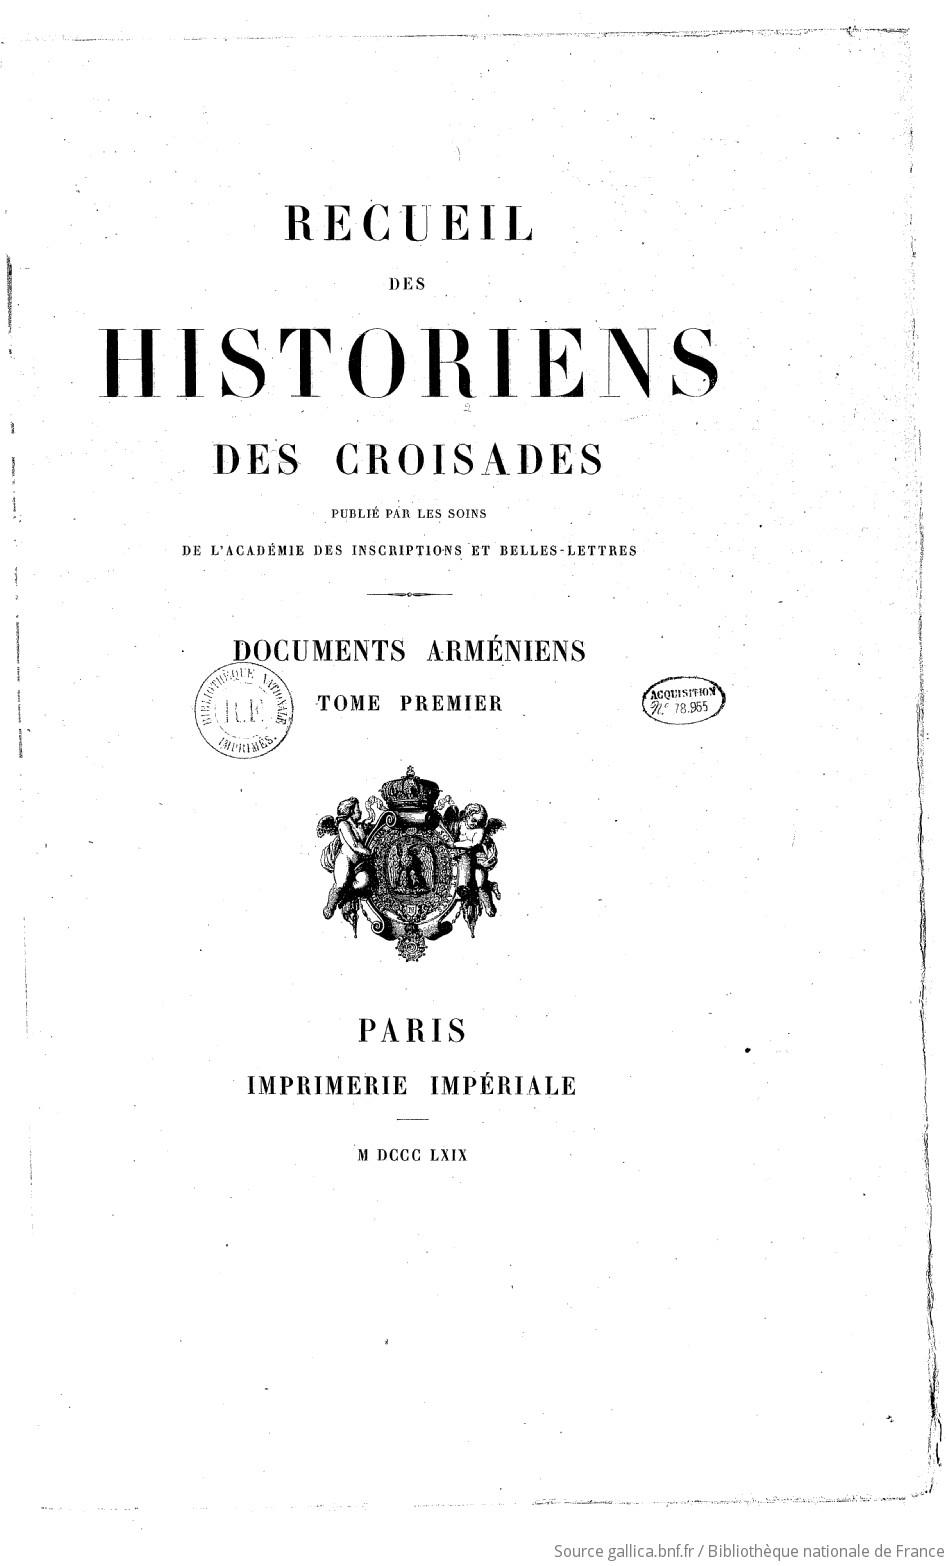 https://gallica.bnf.fr/ark:/12148/bpt6k5774332v/f7.highres